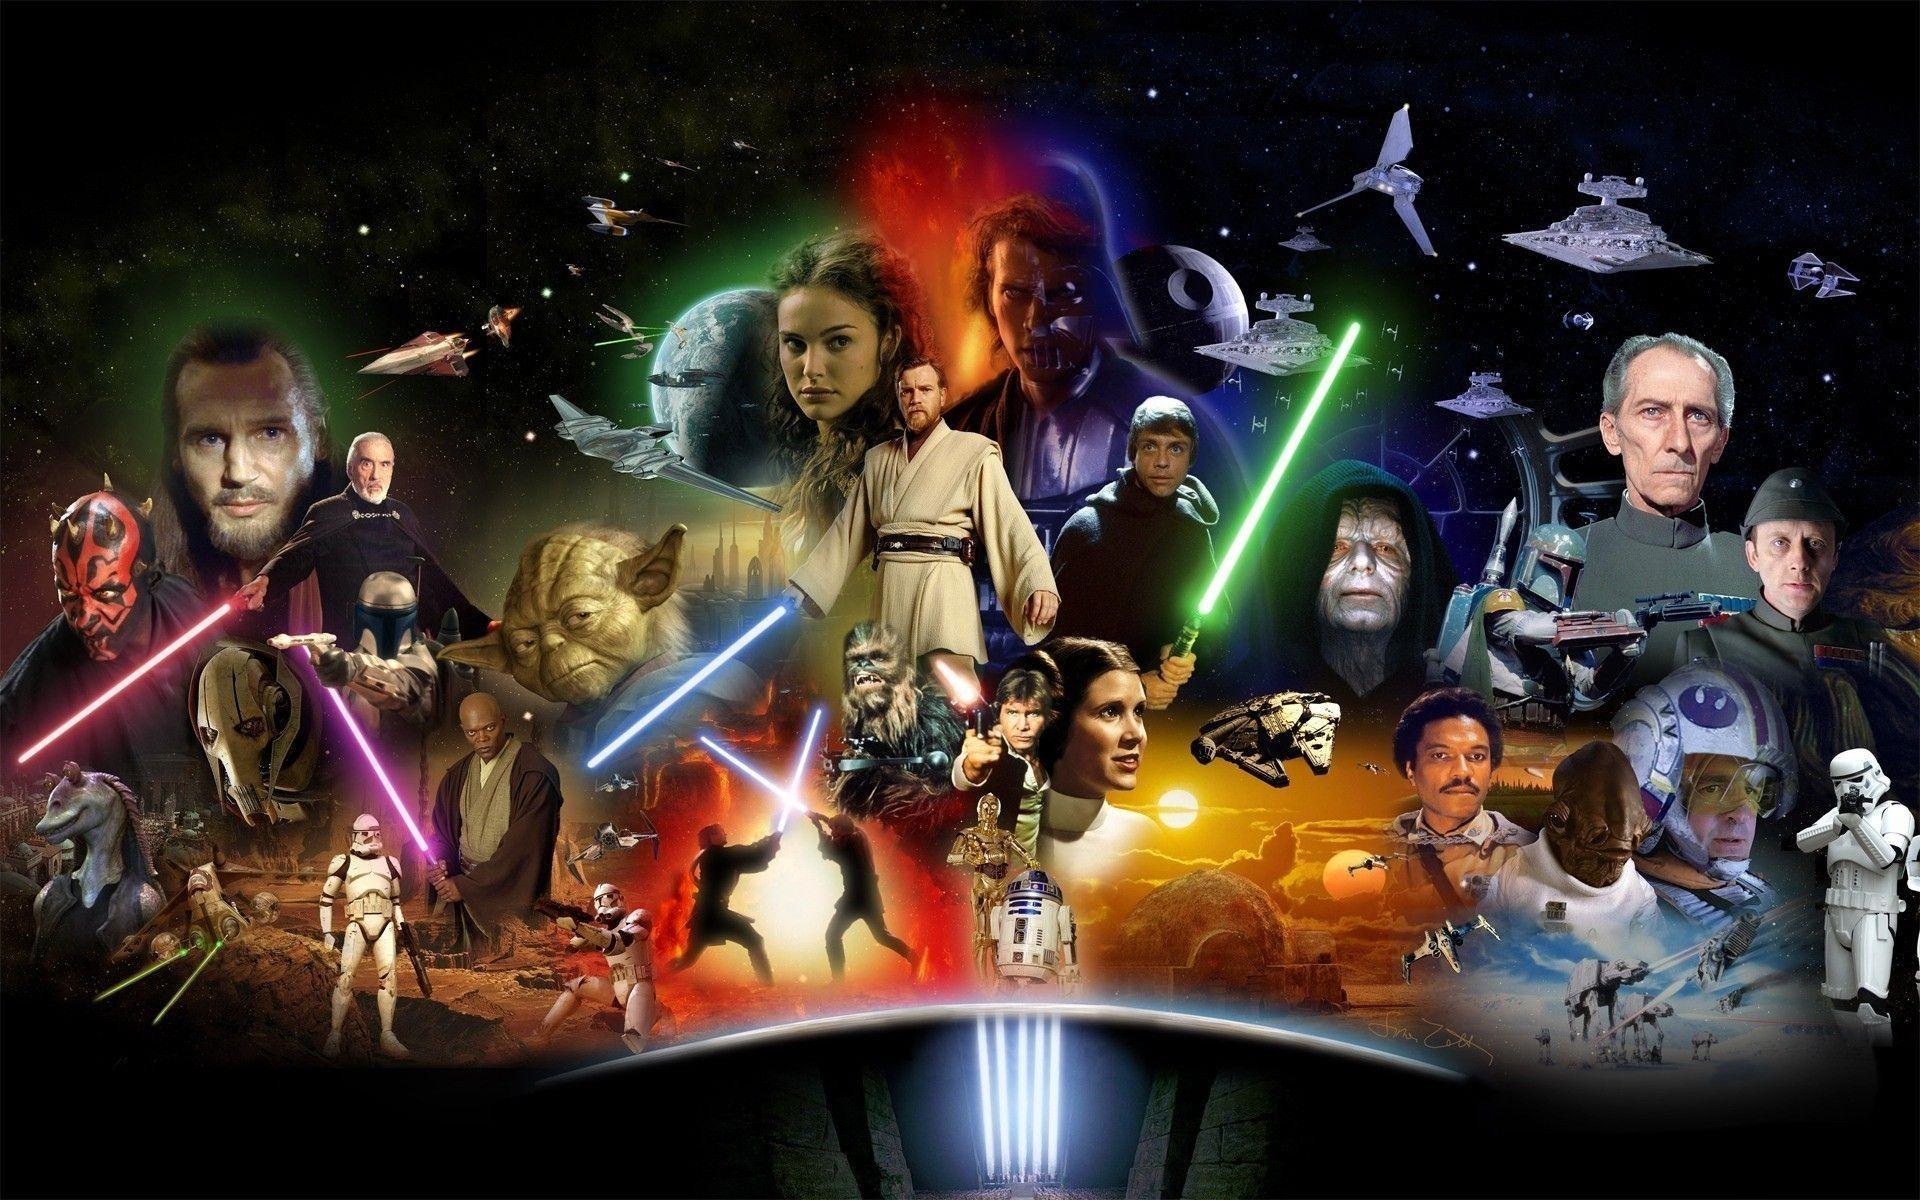 10 Best Star Wars Characters Wallpaper FULL HD 1920×1080 For PC Desktop